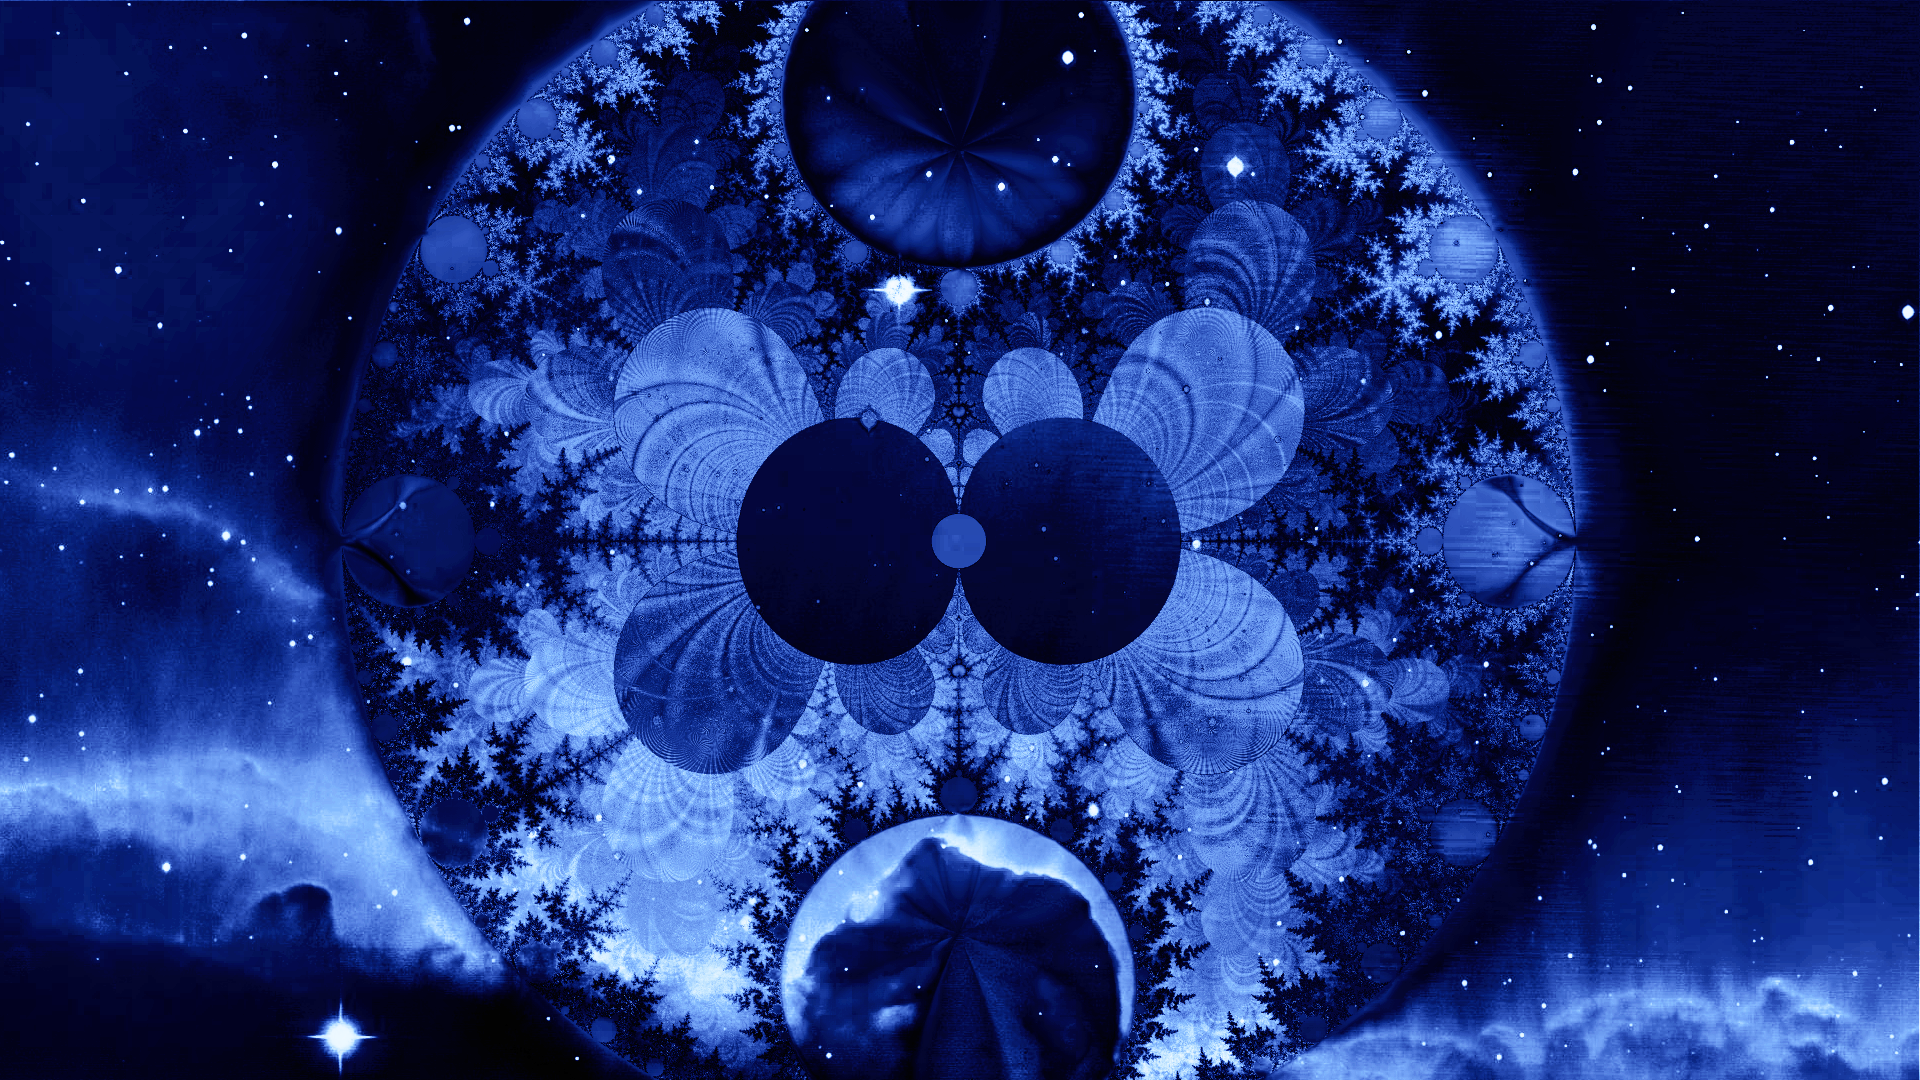 Space Fractal 39 by saintabyssal on DeviantArt  Fractals In Space